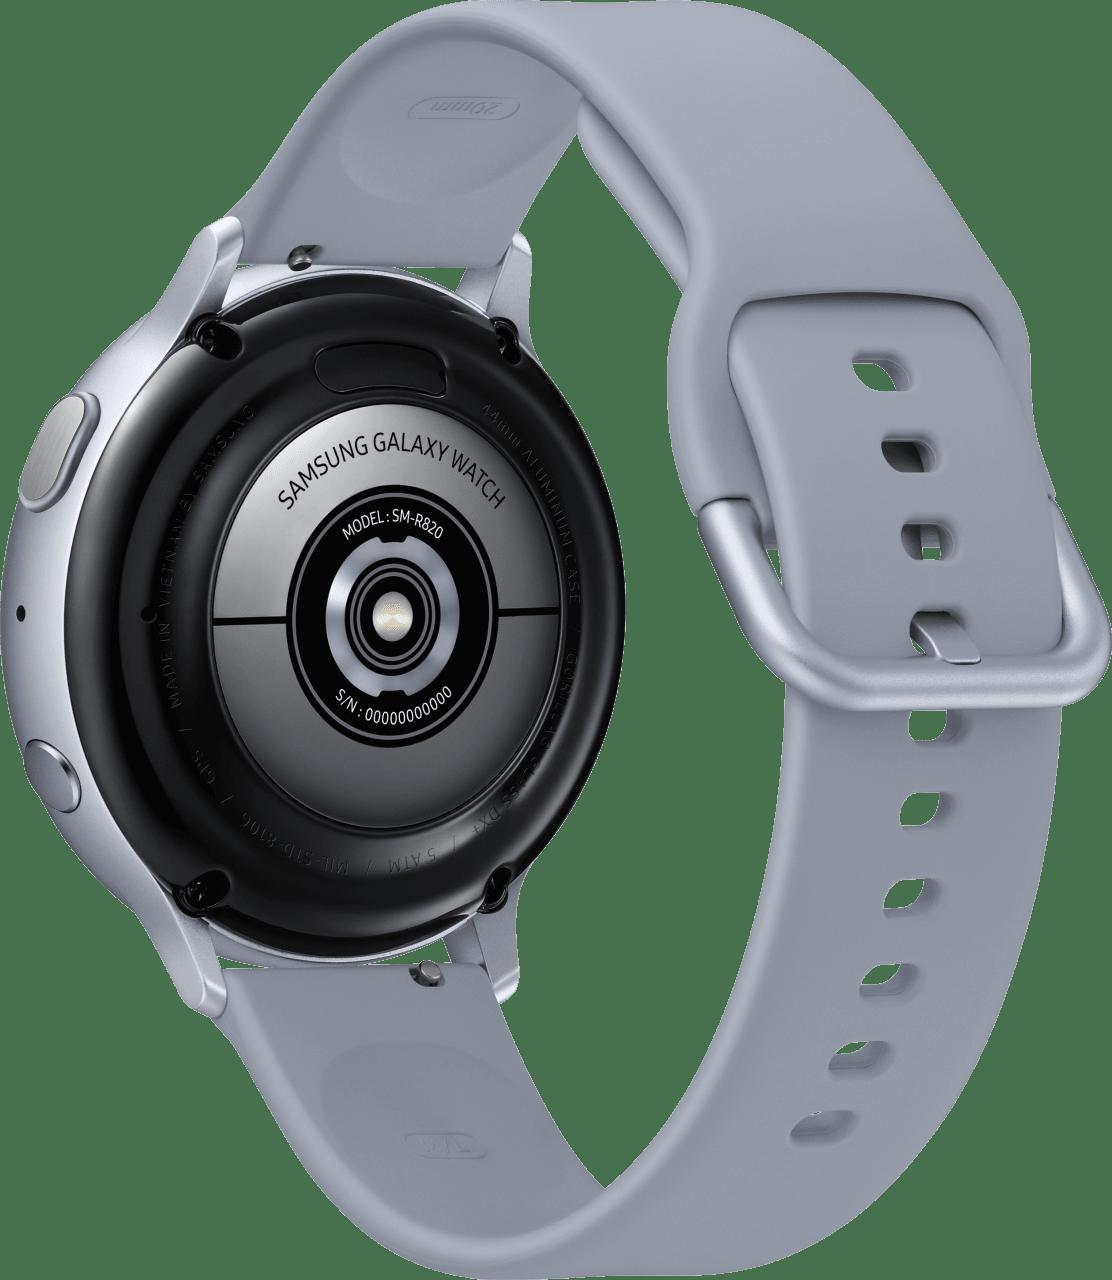 Cloud Silver Samsung Galaxy Watch Active2, 44mm Aluminium case, Sport band.3